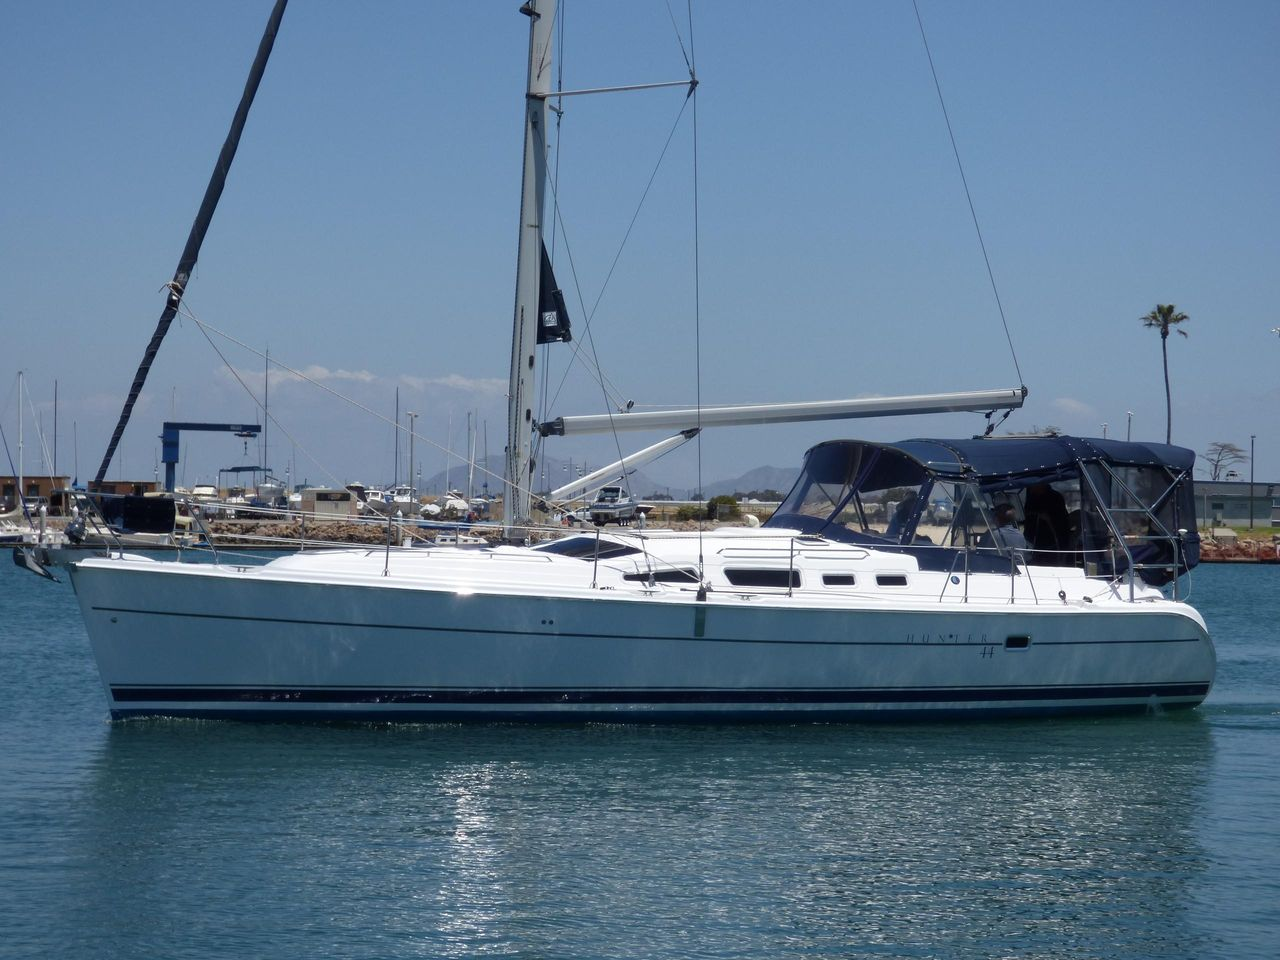 2005 Used Hunter 44 Cruiser Sailboat For Sale - $149,900 - CA, US